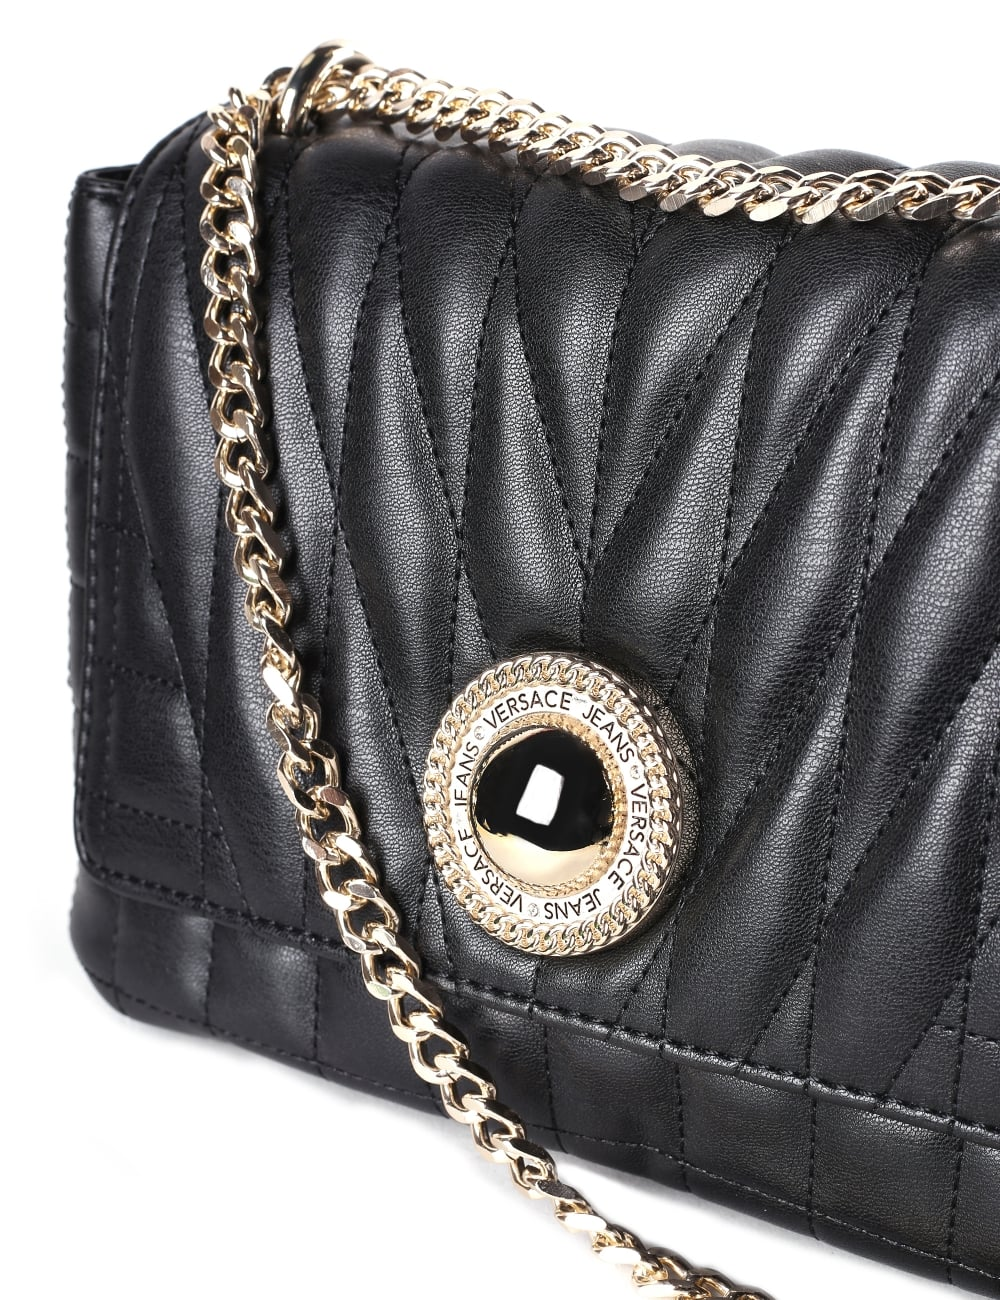 c5045203aa8 Verscae Jeans Women s Quilted Shoulder Bag